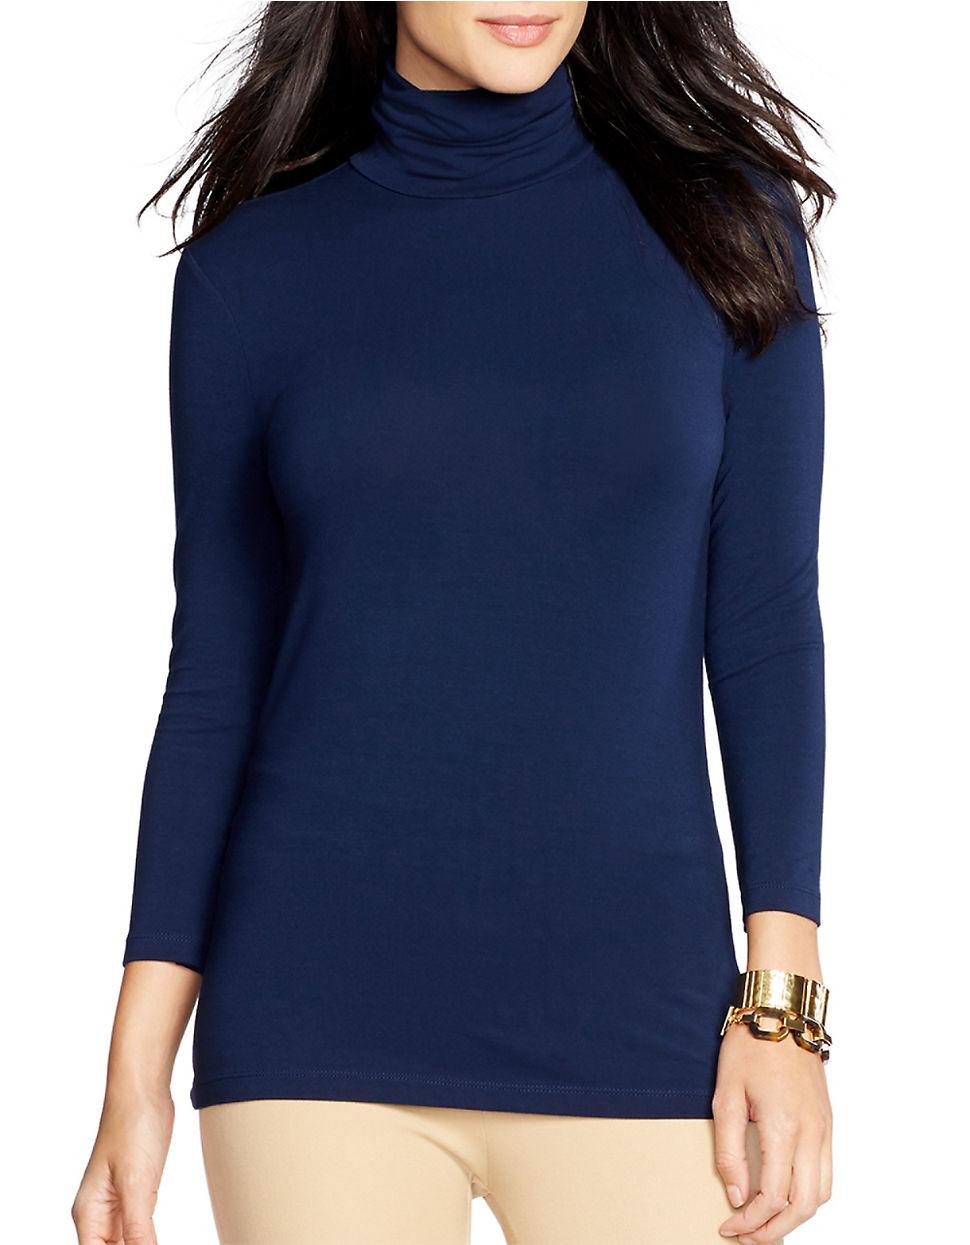 Lauren By Ralph Lauren Synthetic Stretch Jersey Turtleneck Shirt In Navy Blue Lyst